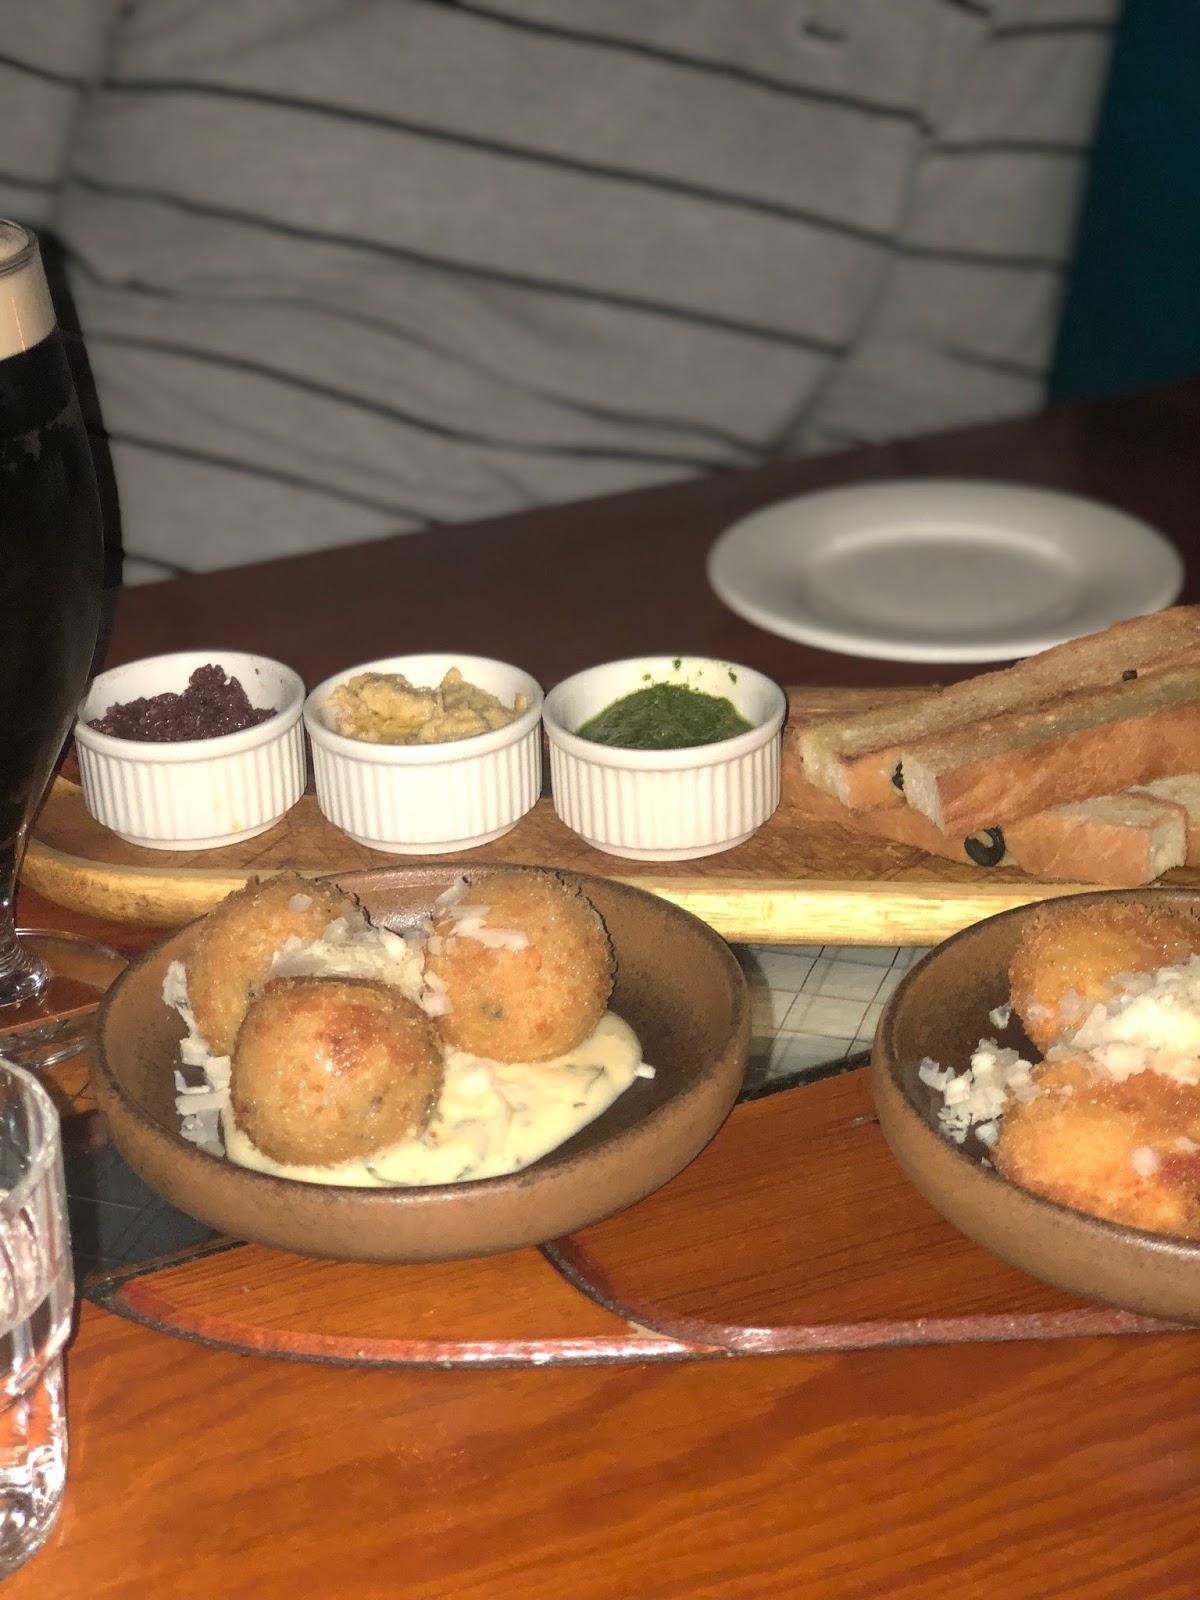 Where to eat in dubin, places to dine in dublin, Italian restaurant dublin, tapas in dublin, light fare dublin